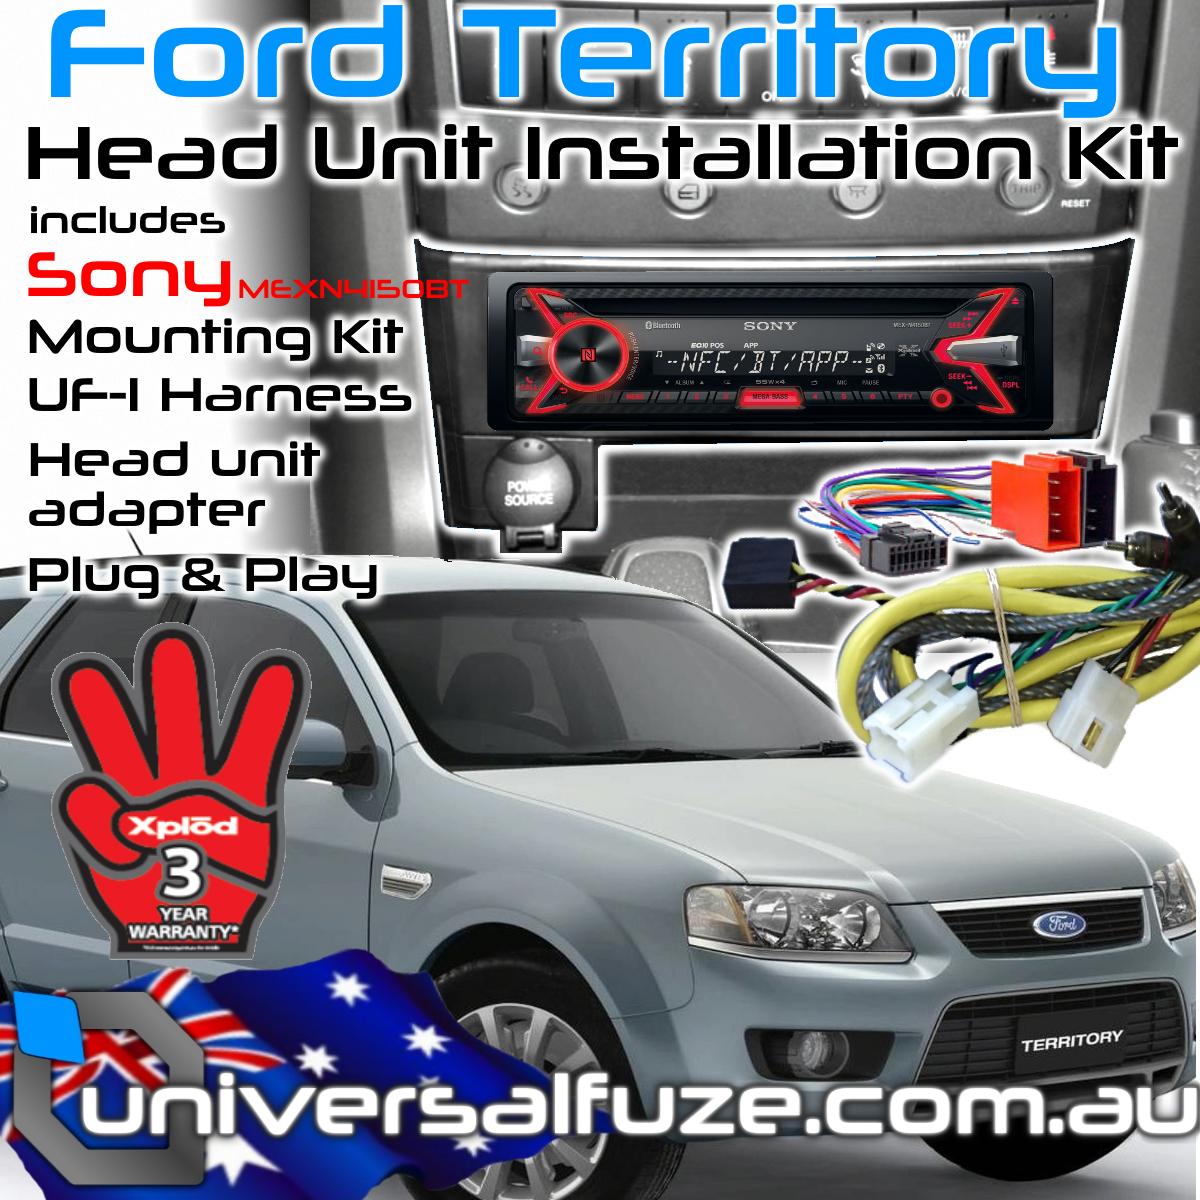 Ford Territory Sony Bluetooth USB Upgrade Kit eBay